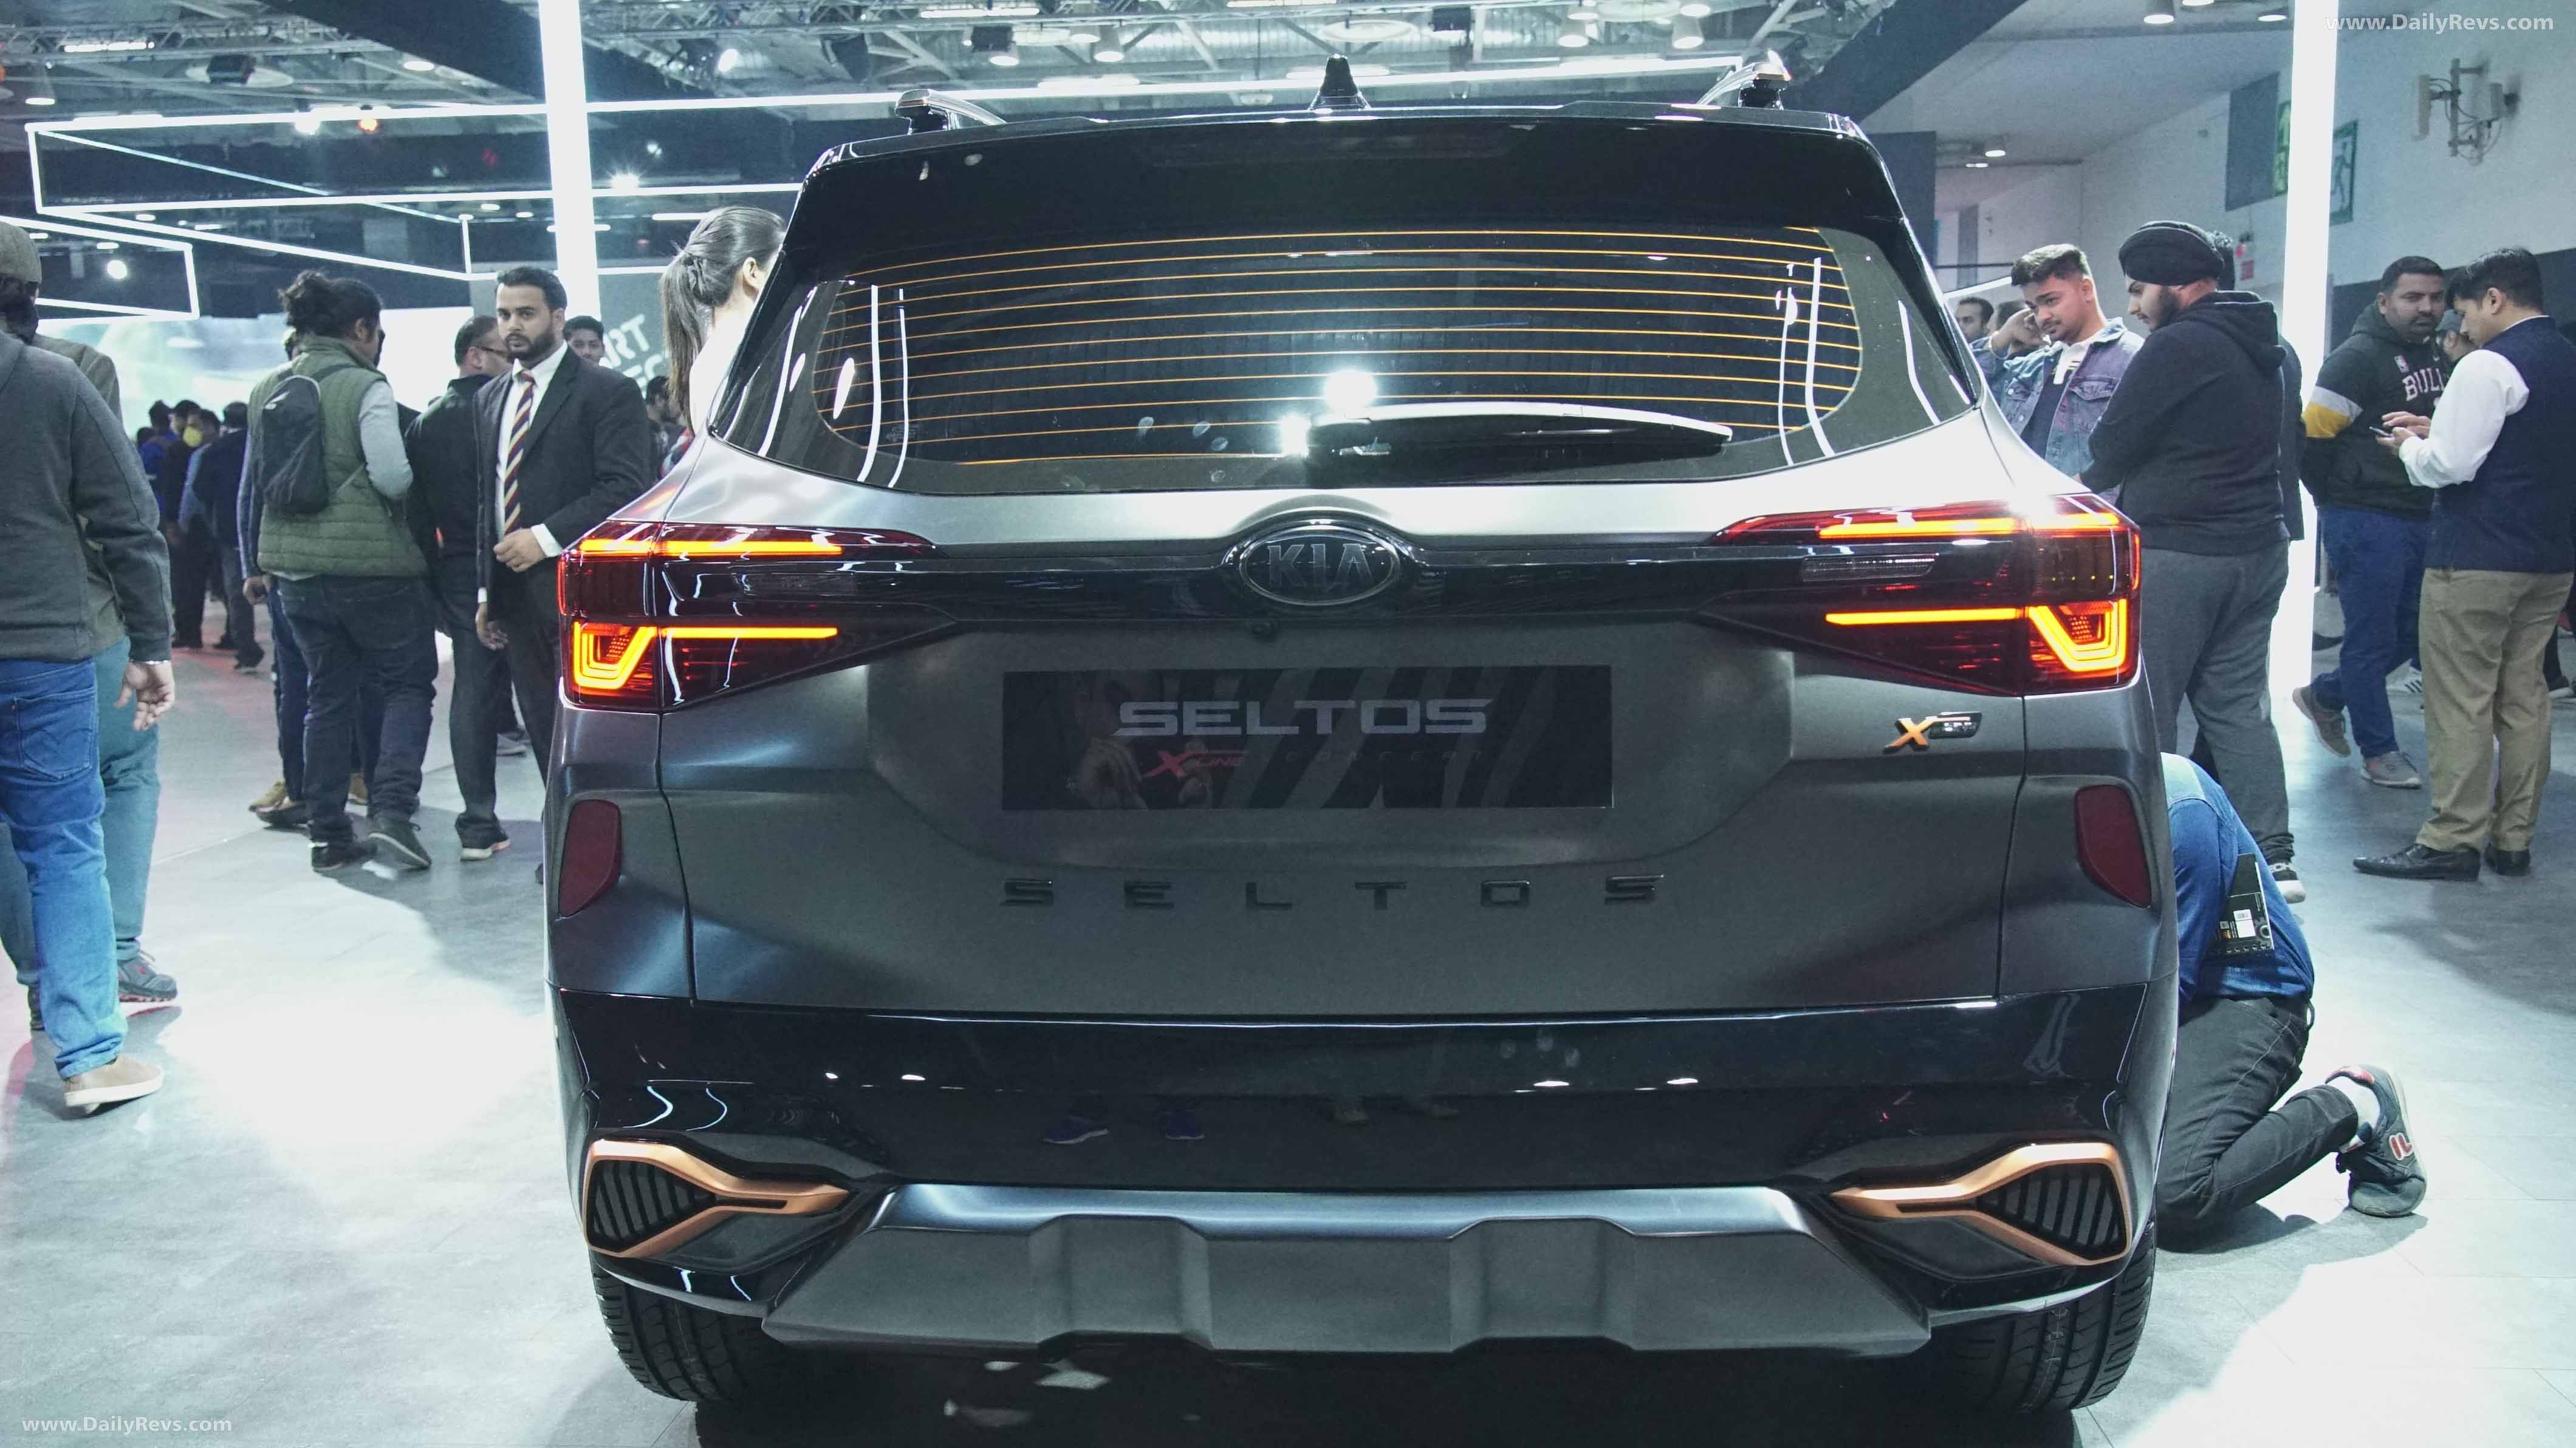 2020 Kia Seltos Xline Dailyrevs in 2020 Kia, Luxury